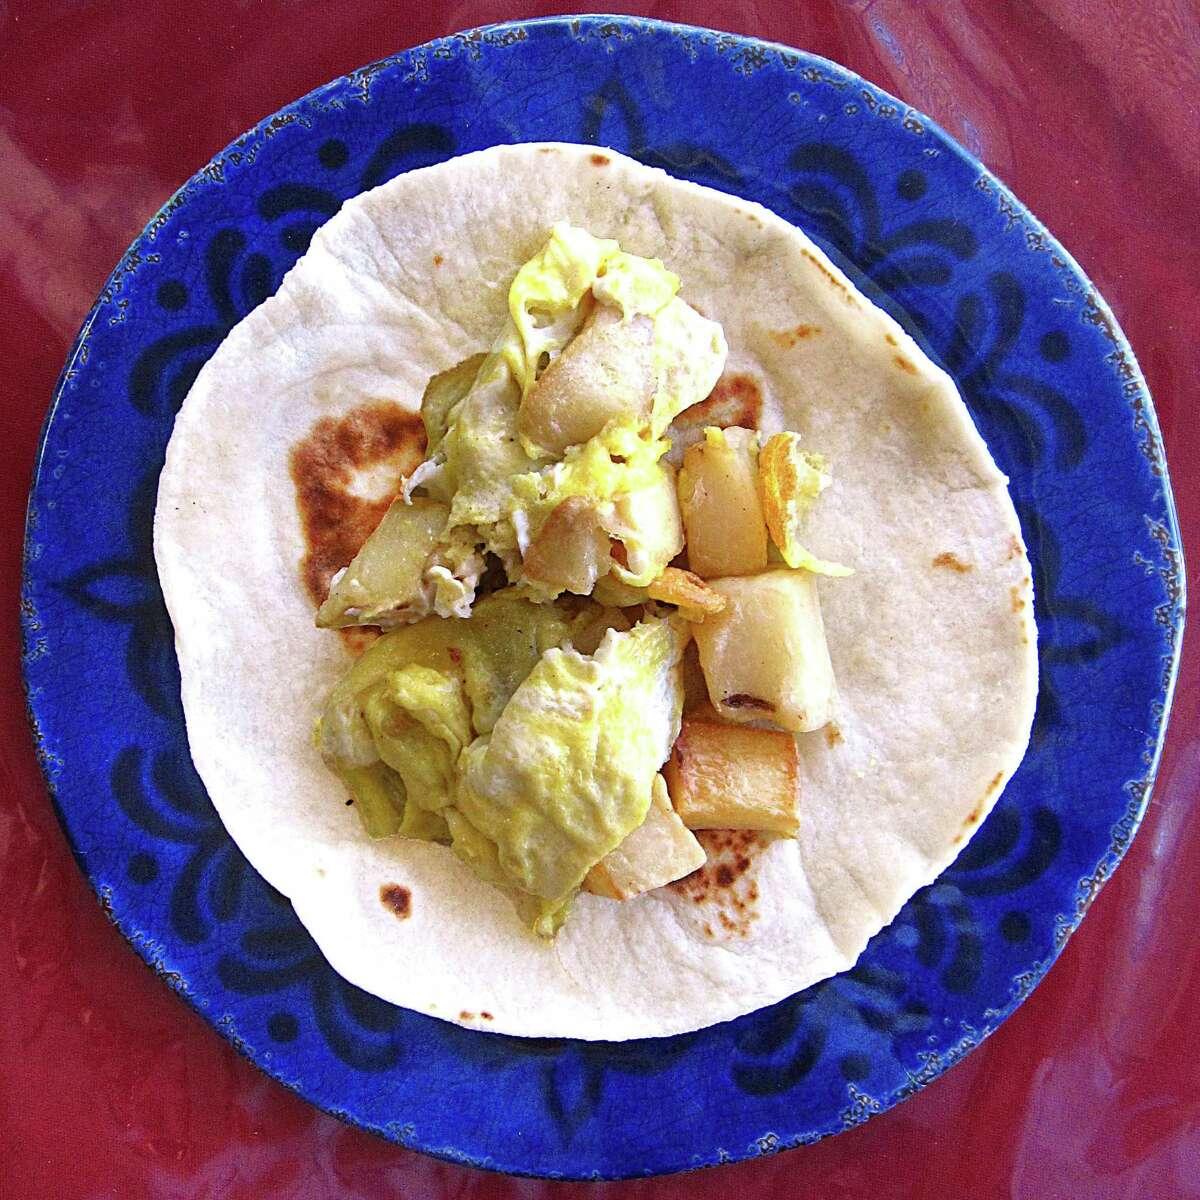 Potato and egg taco on a handmade flour tortilla from Peter El Norteño.